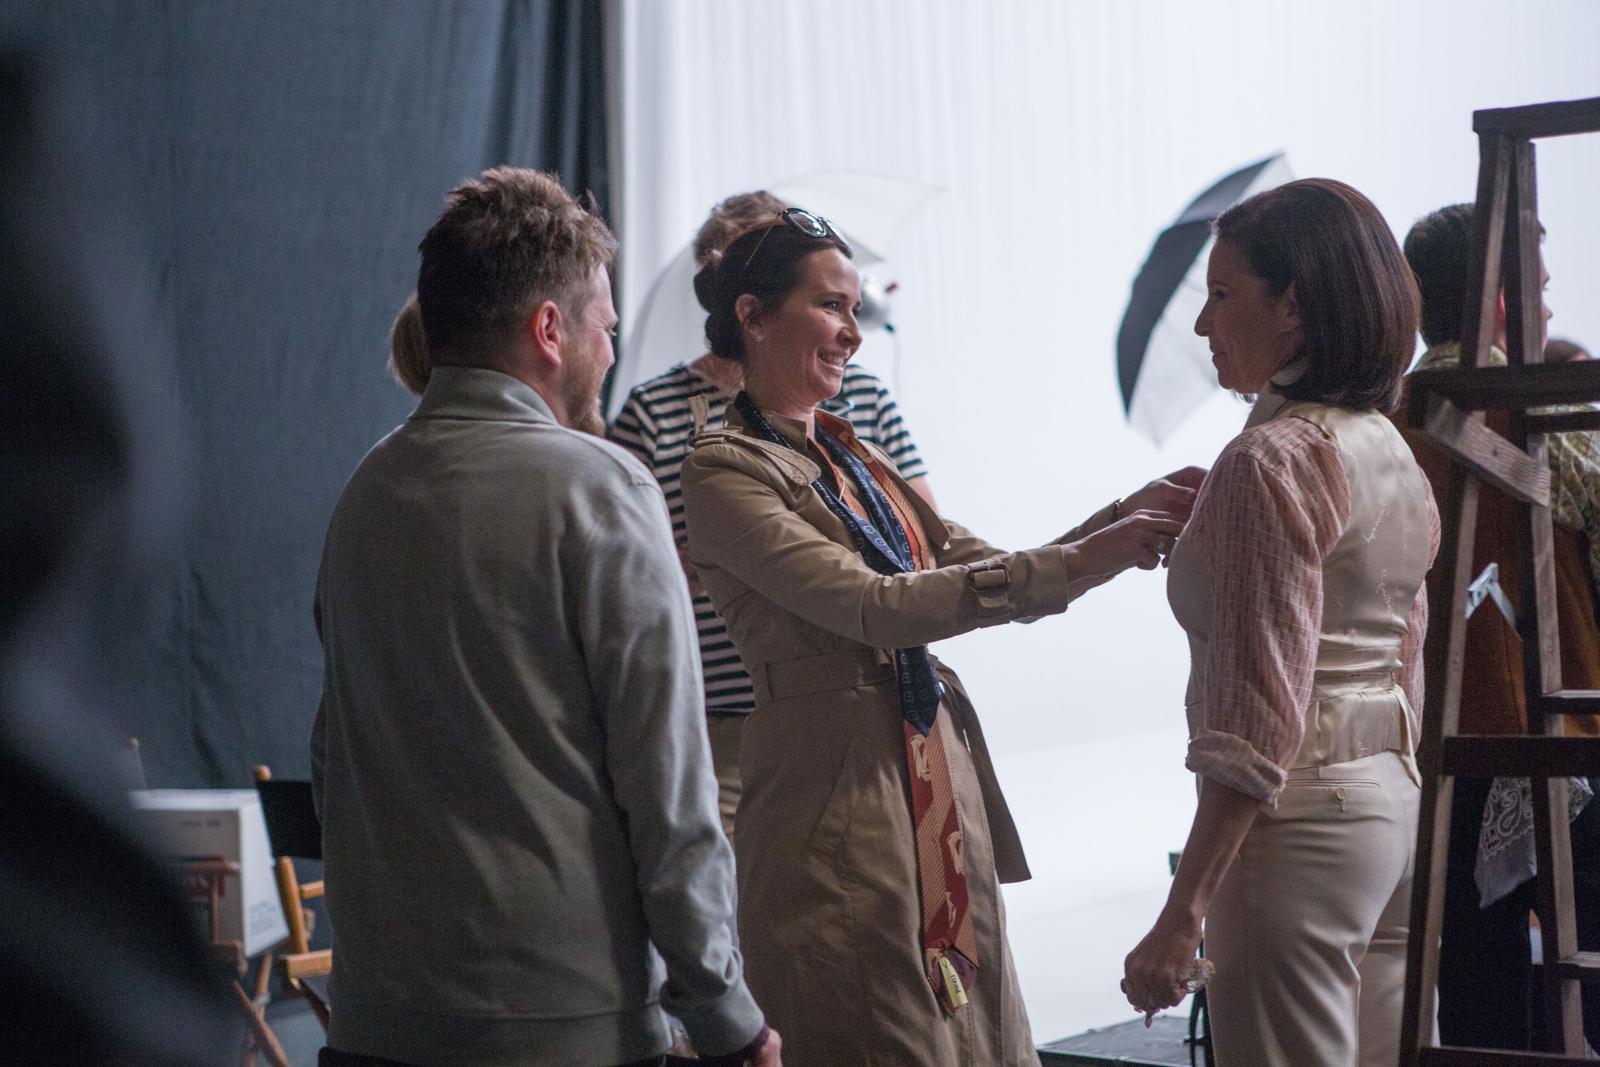 costume designer Janie Bryant on the set of Mad Men